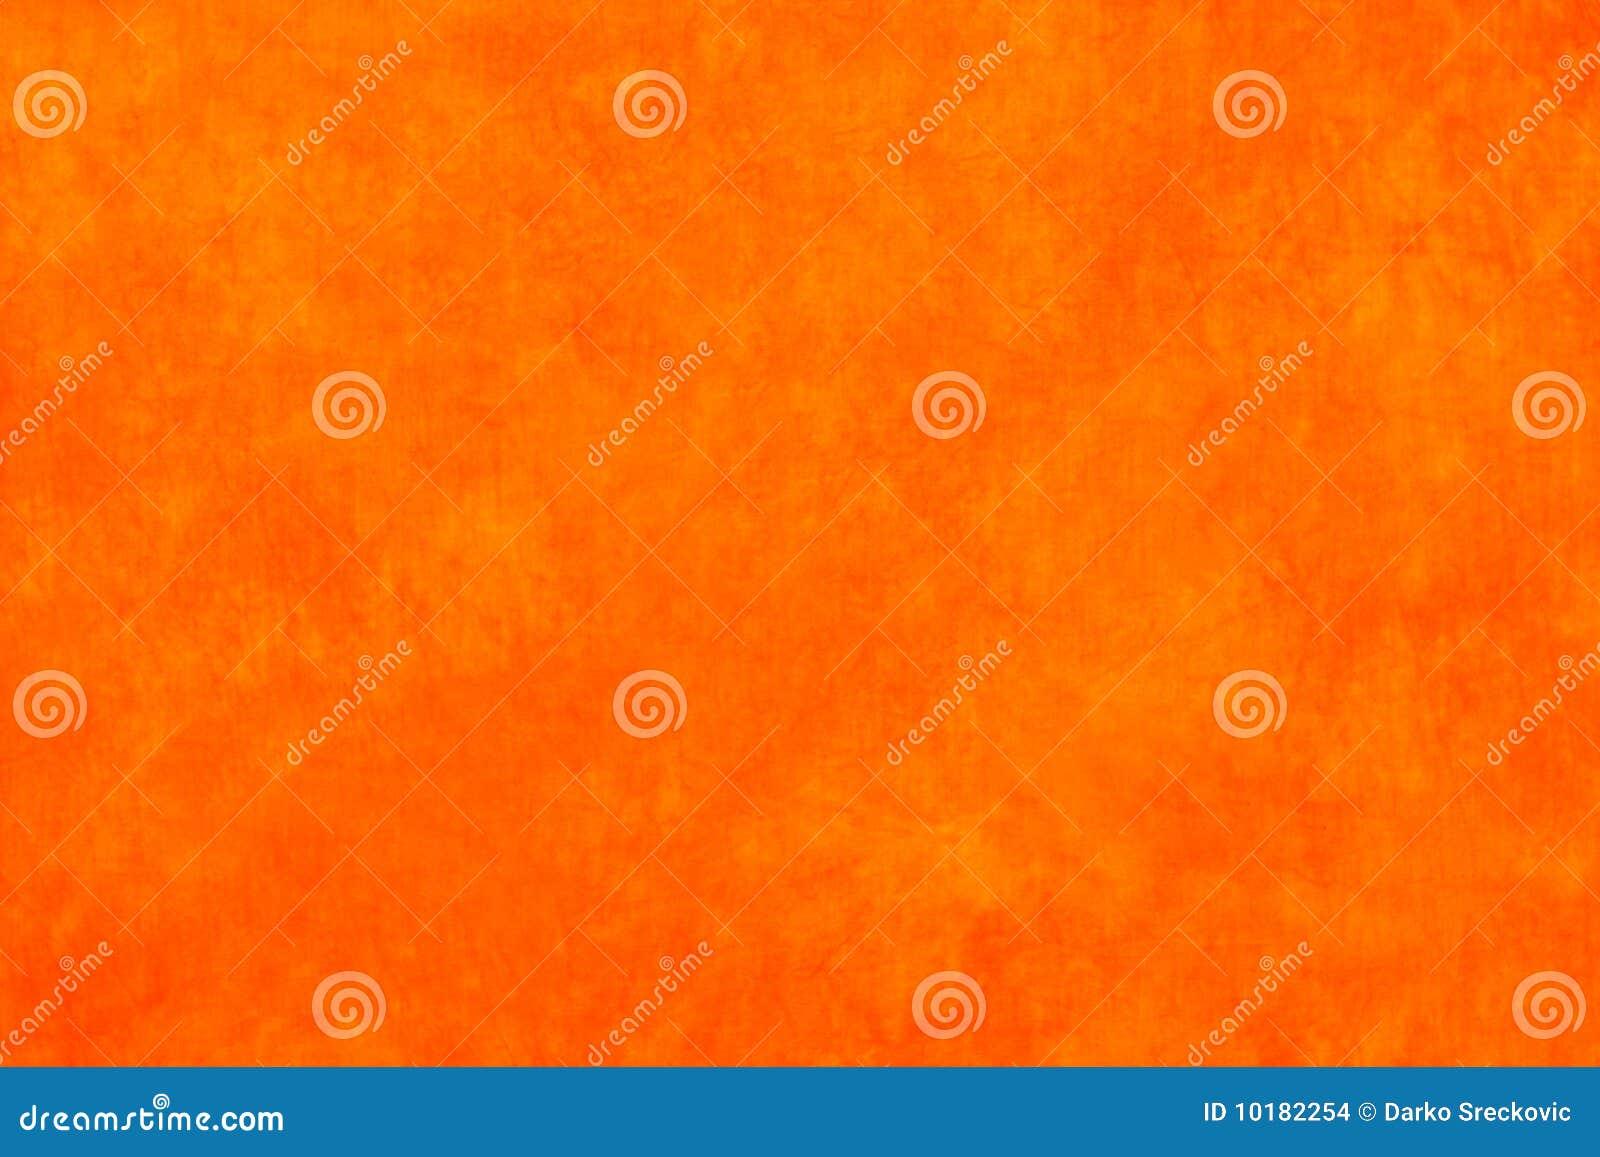 Simple orange background